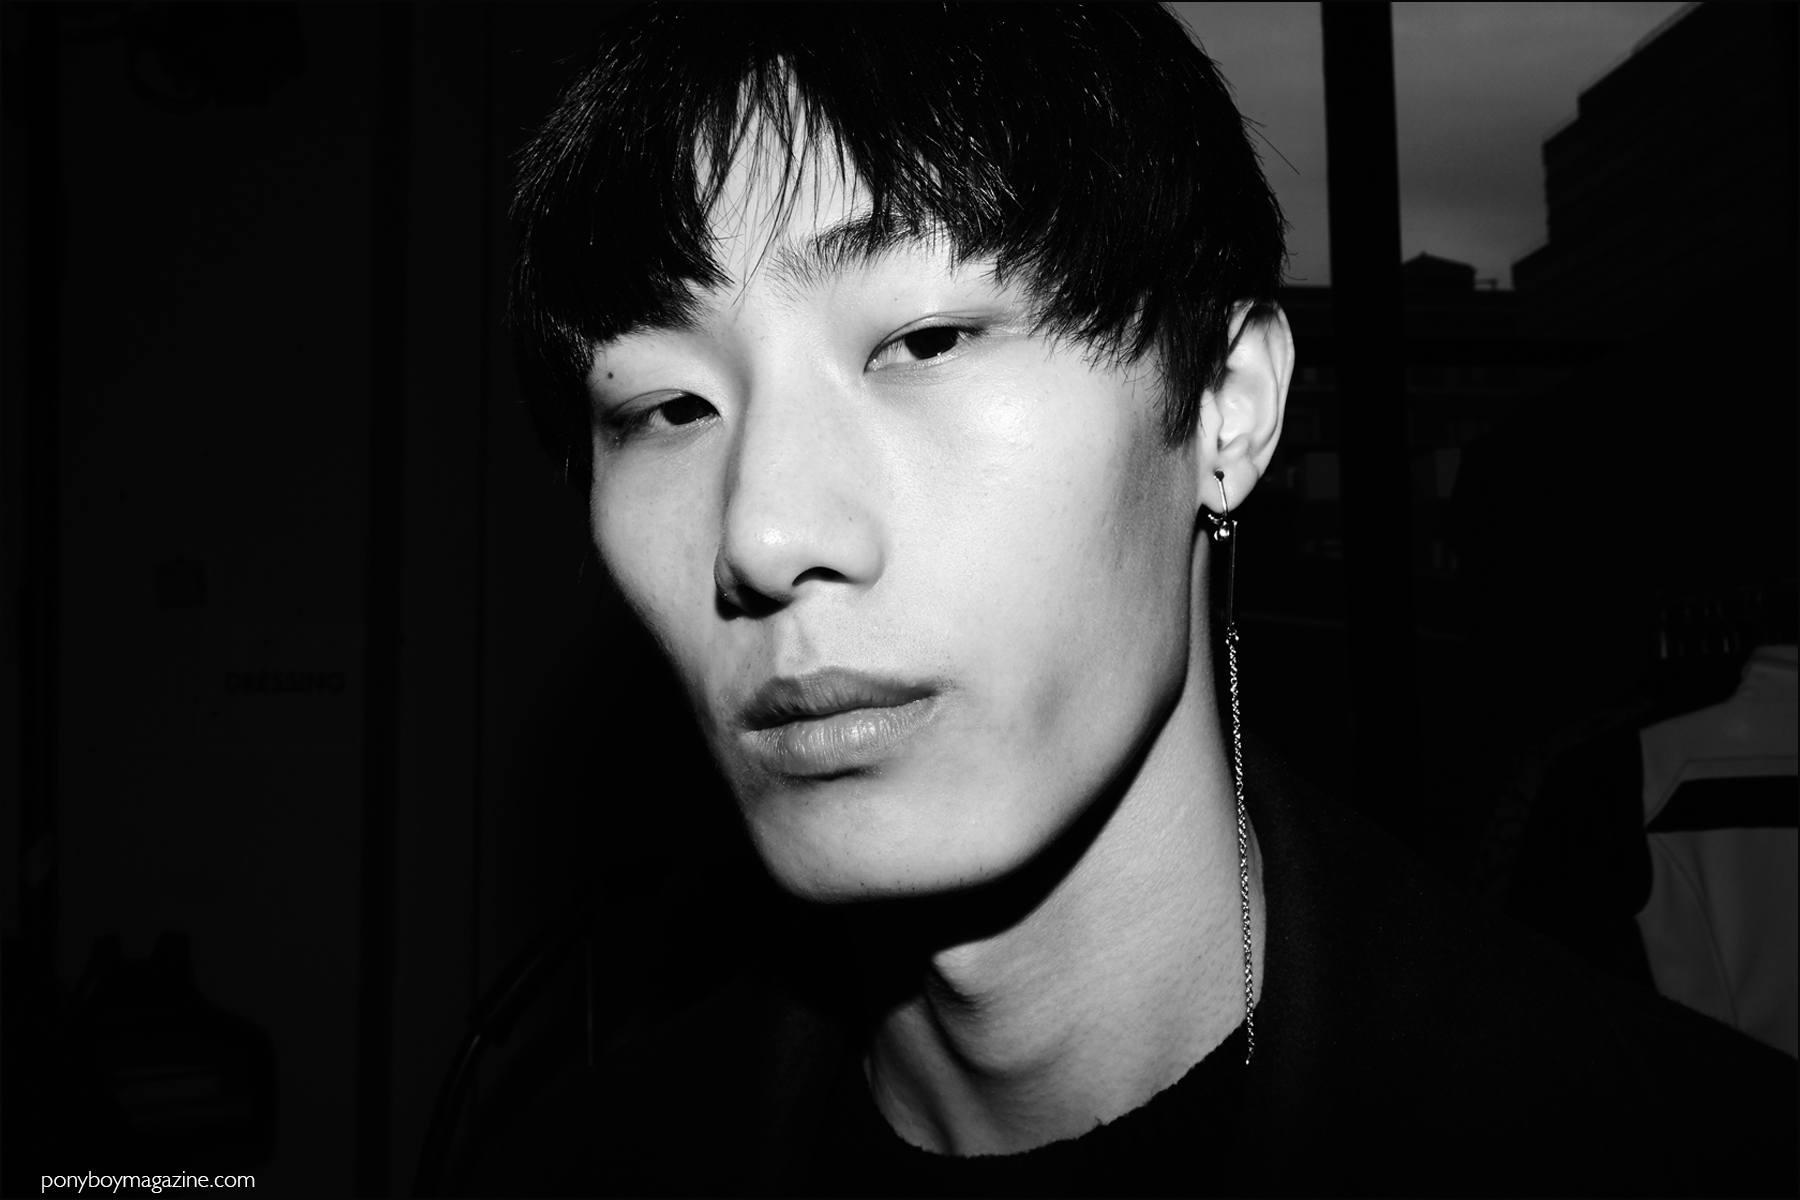 Male model Yan Kai Wen photographed backstage at Kenneth Ning F/W16 menswear show. Photography by Alexander Thompson for Ponyboy magazine NY.